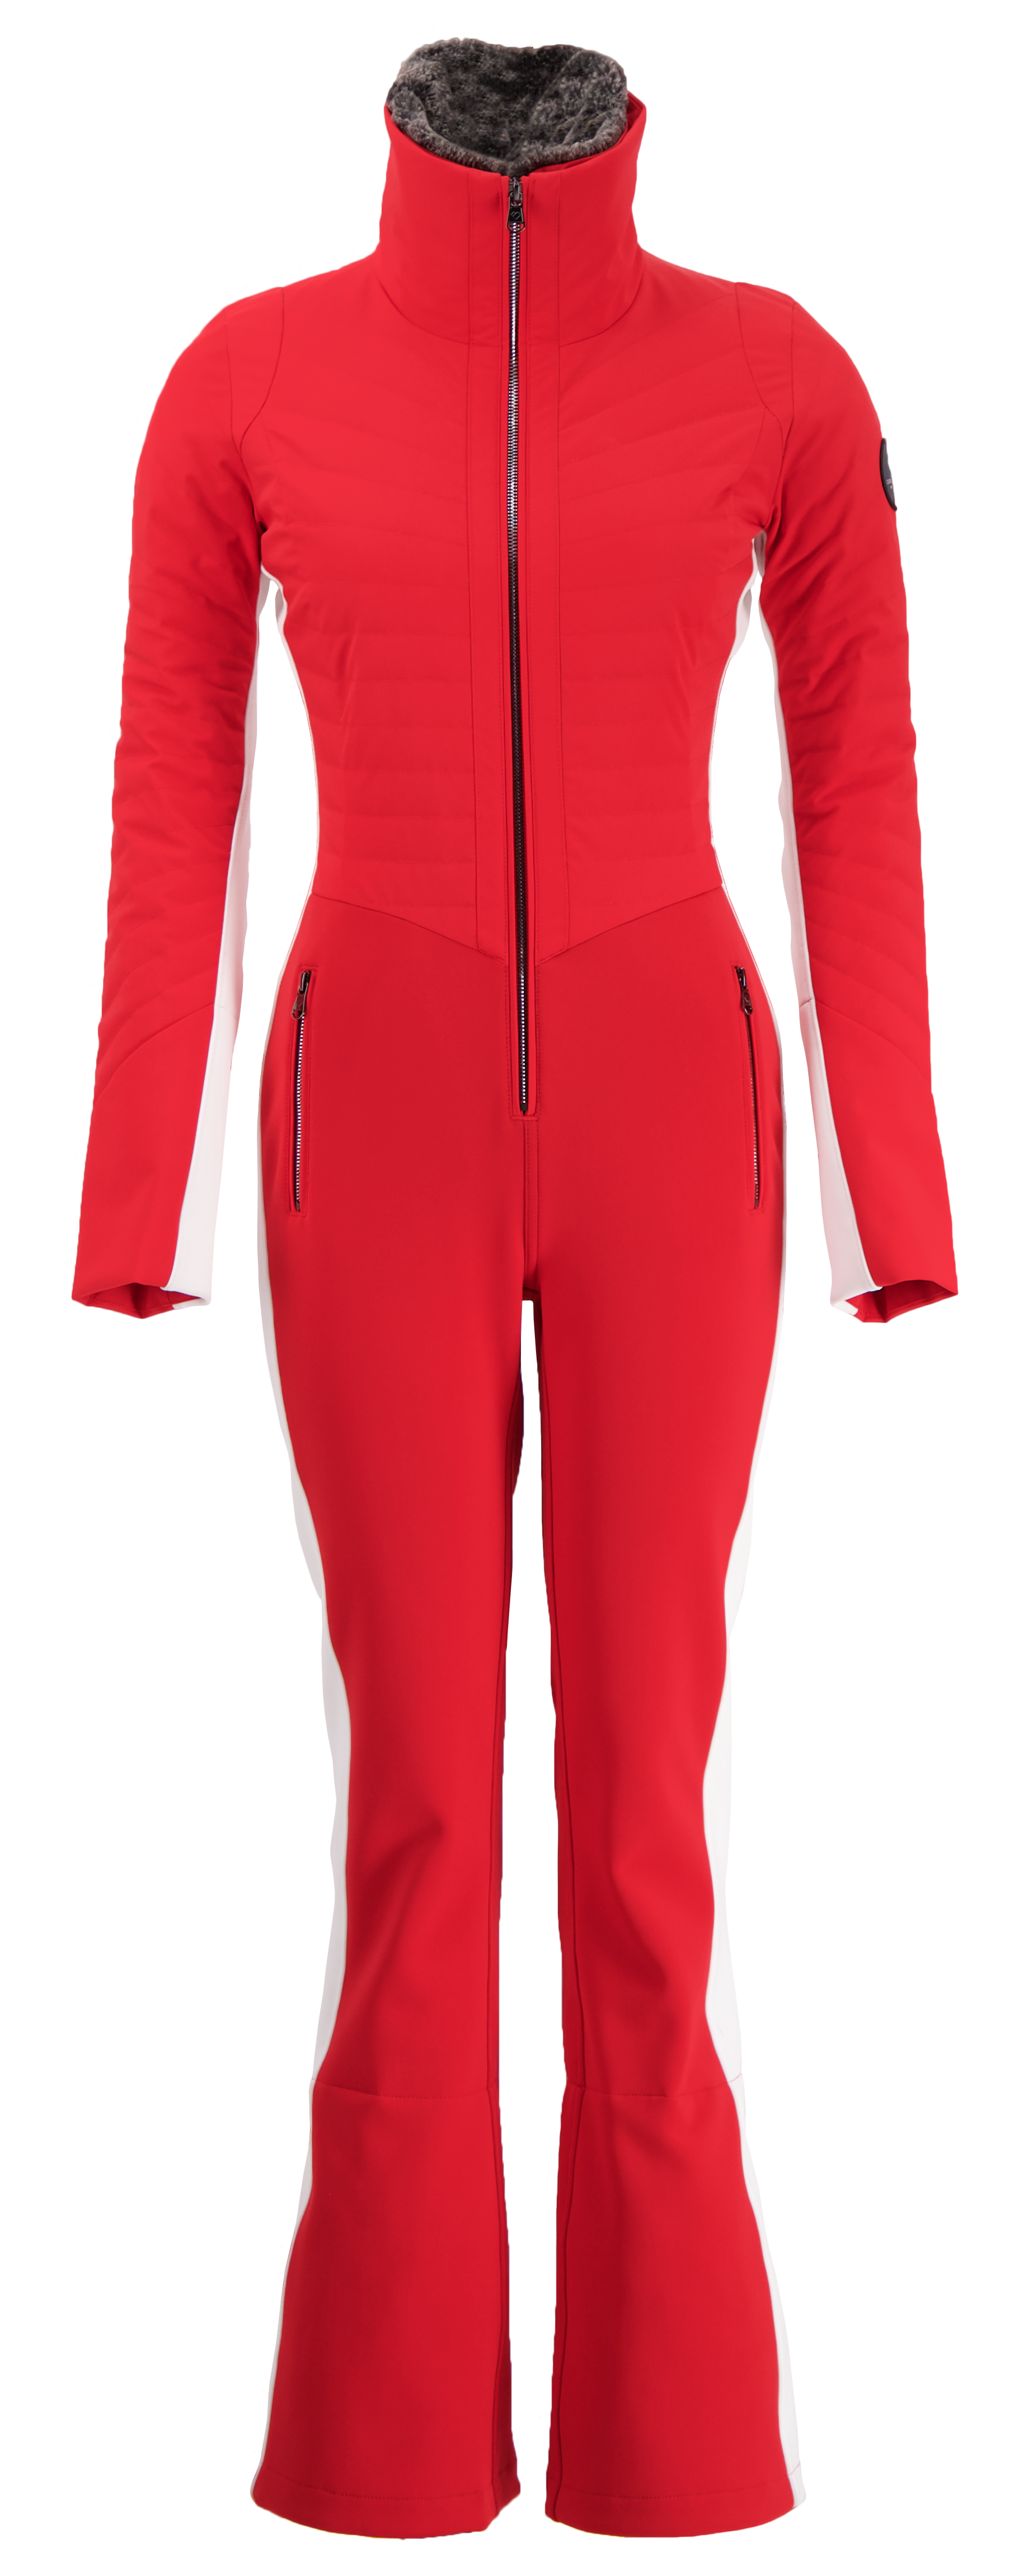 SKI-00371 OSP-001875 Women's Workout Jacket